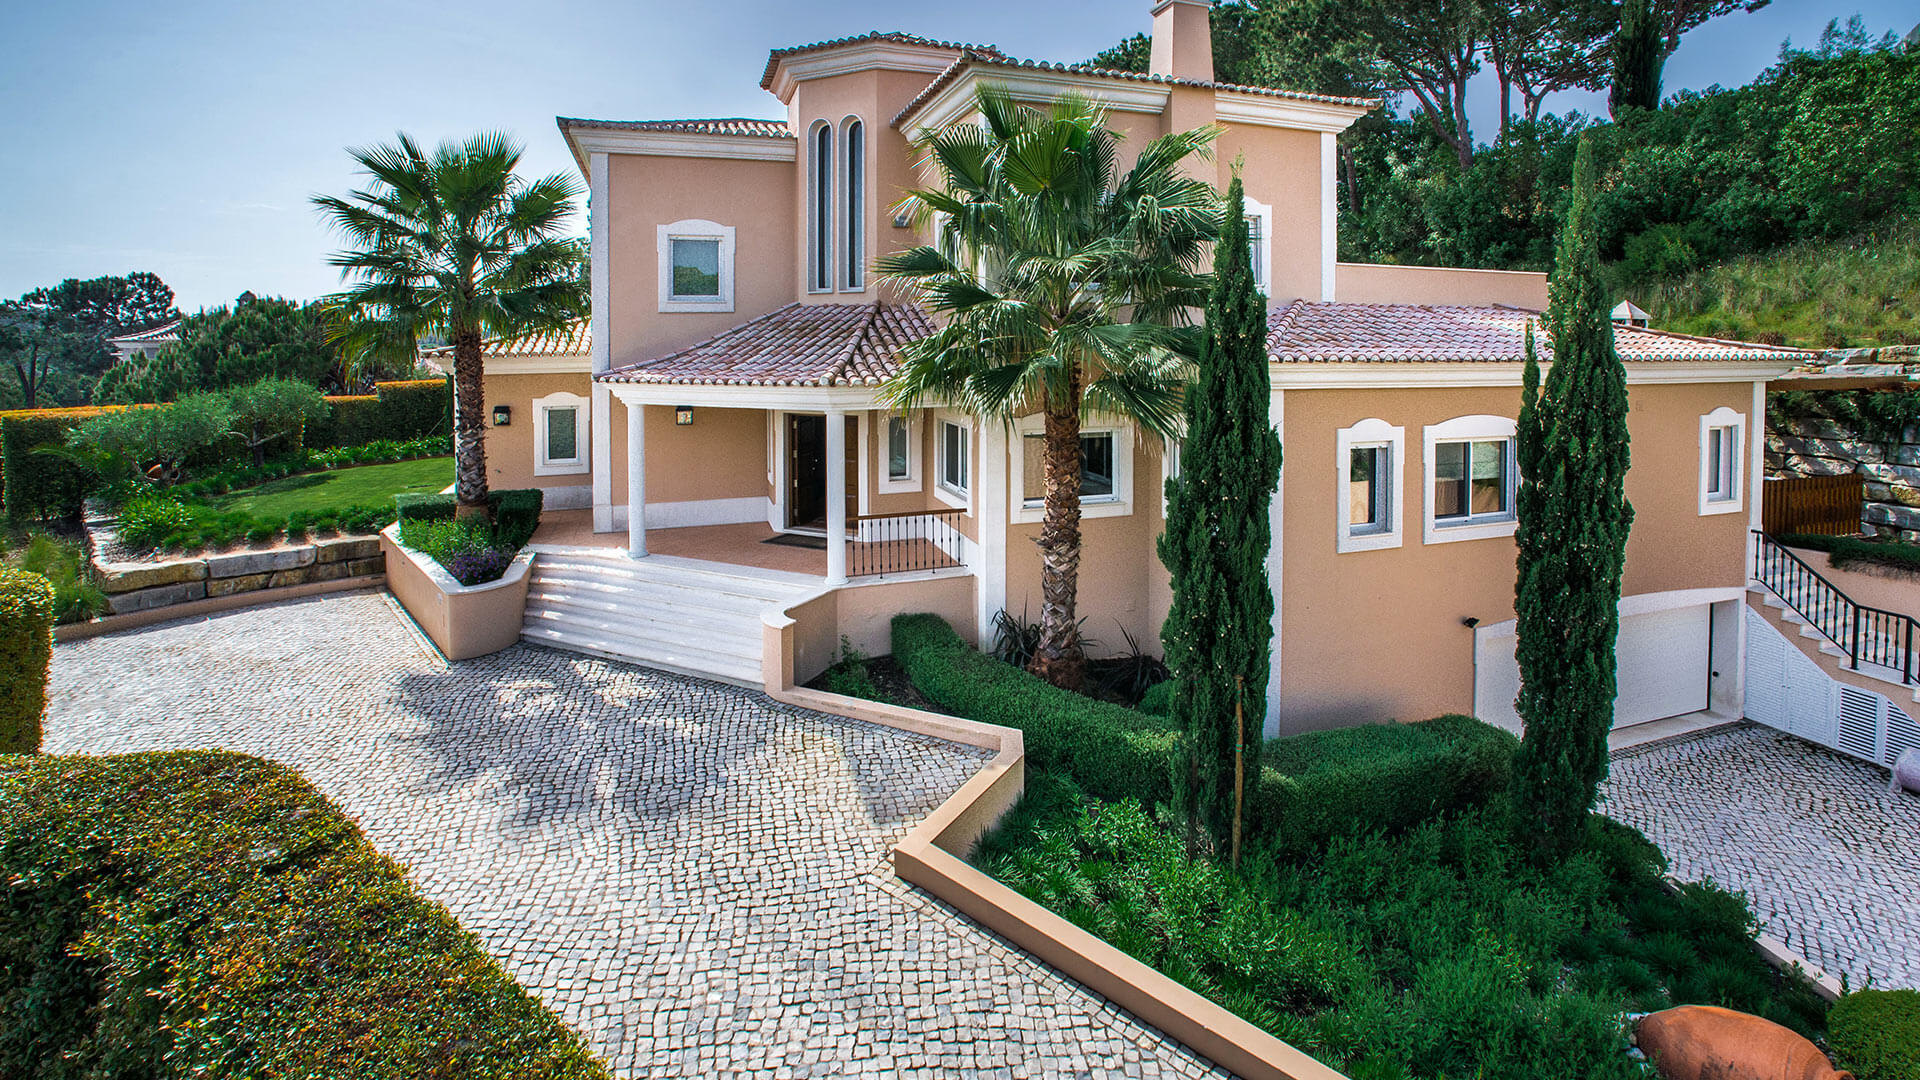 Villa Villa Onix, Affitto a Algarve